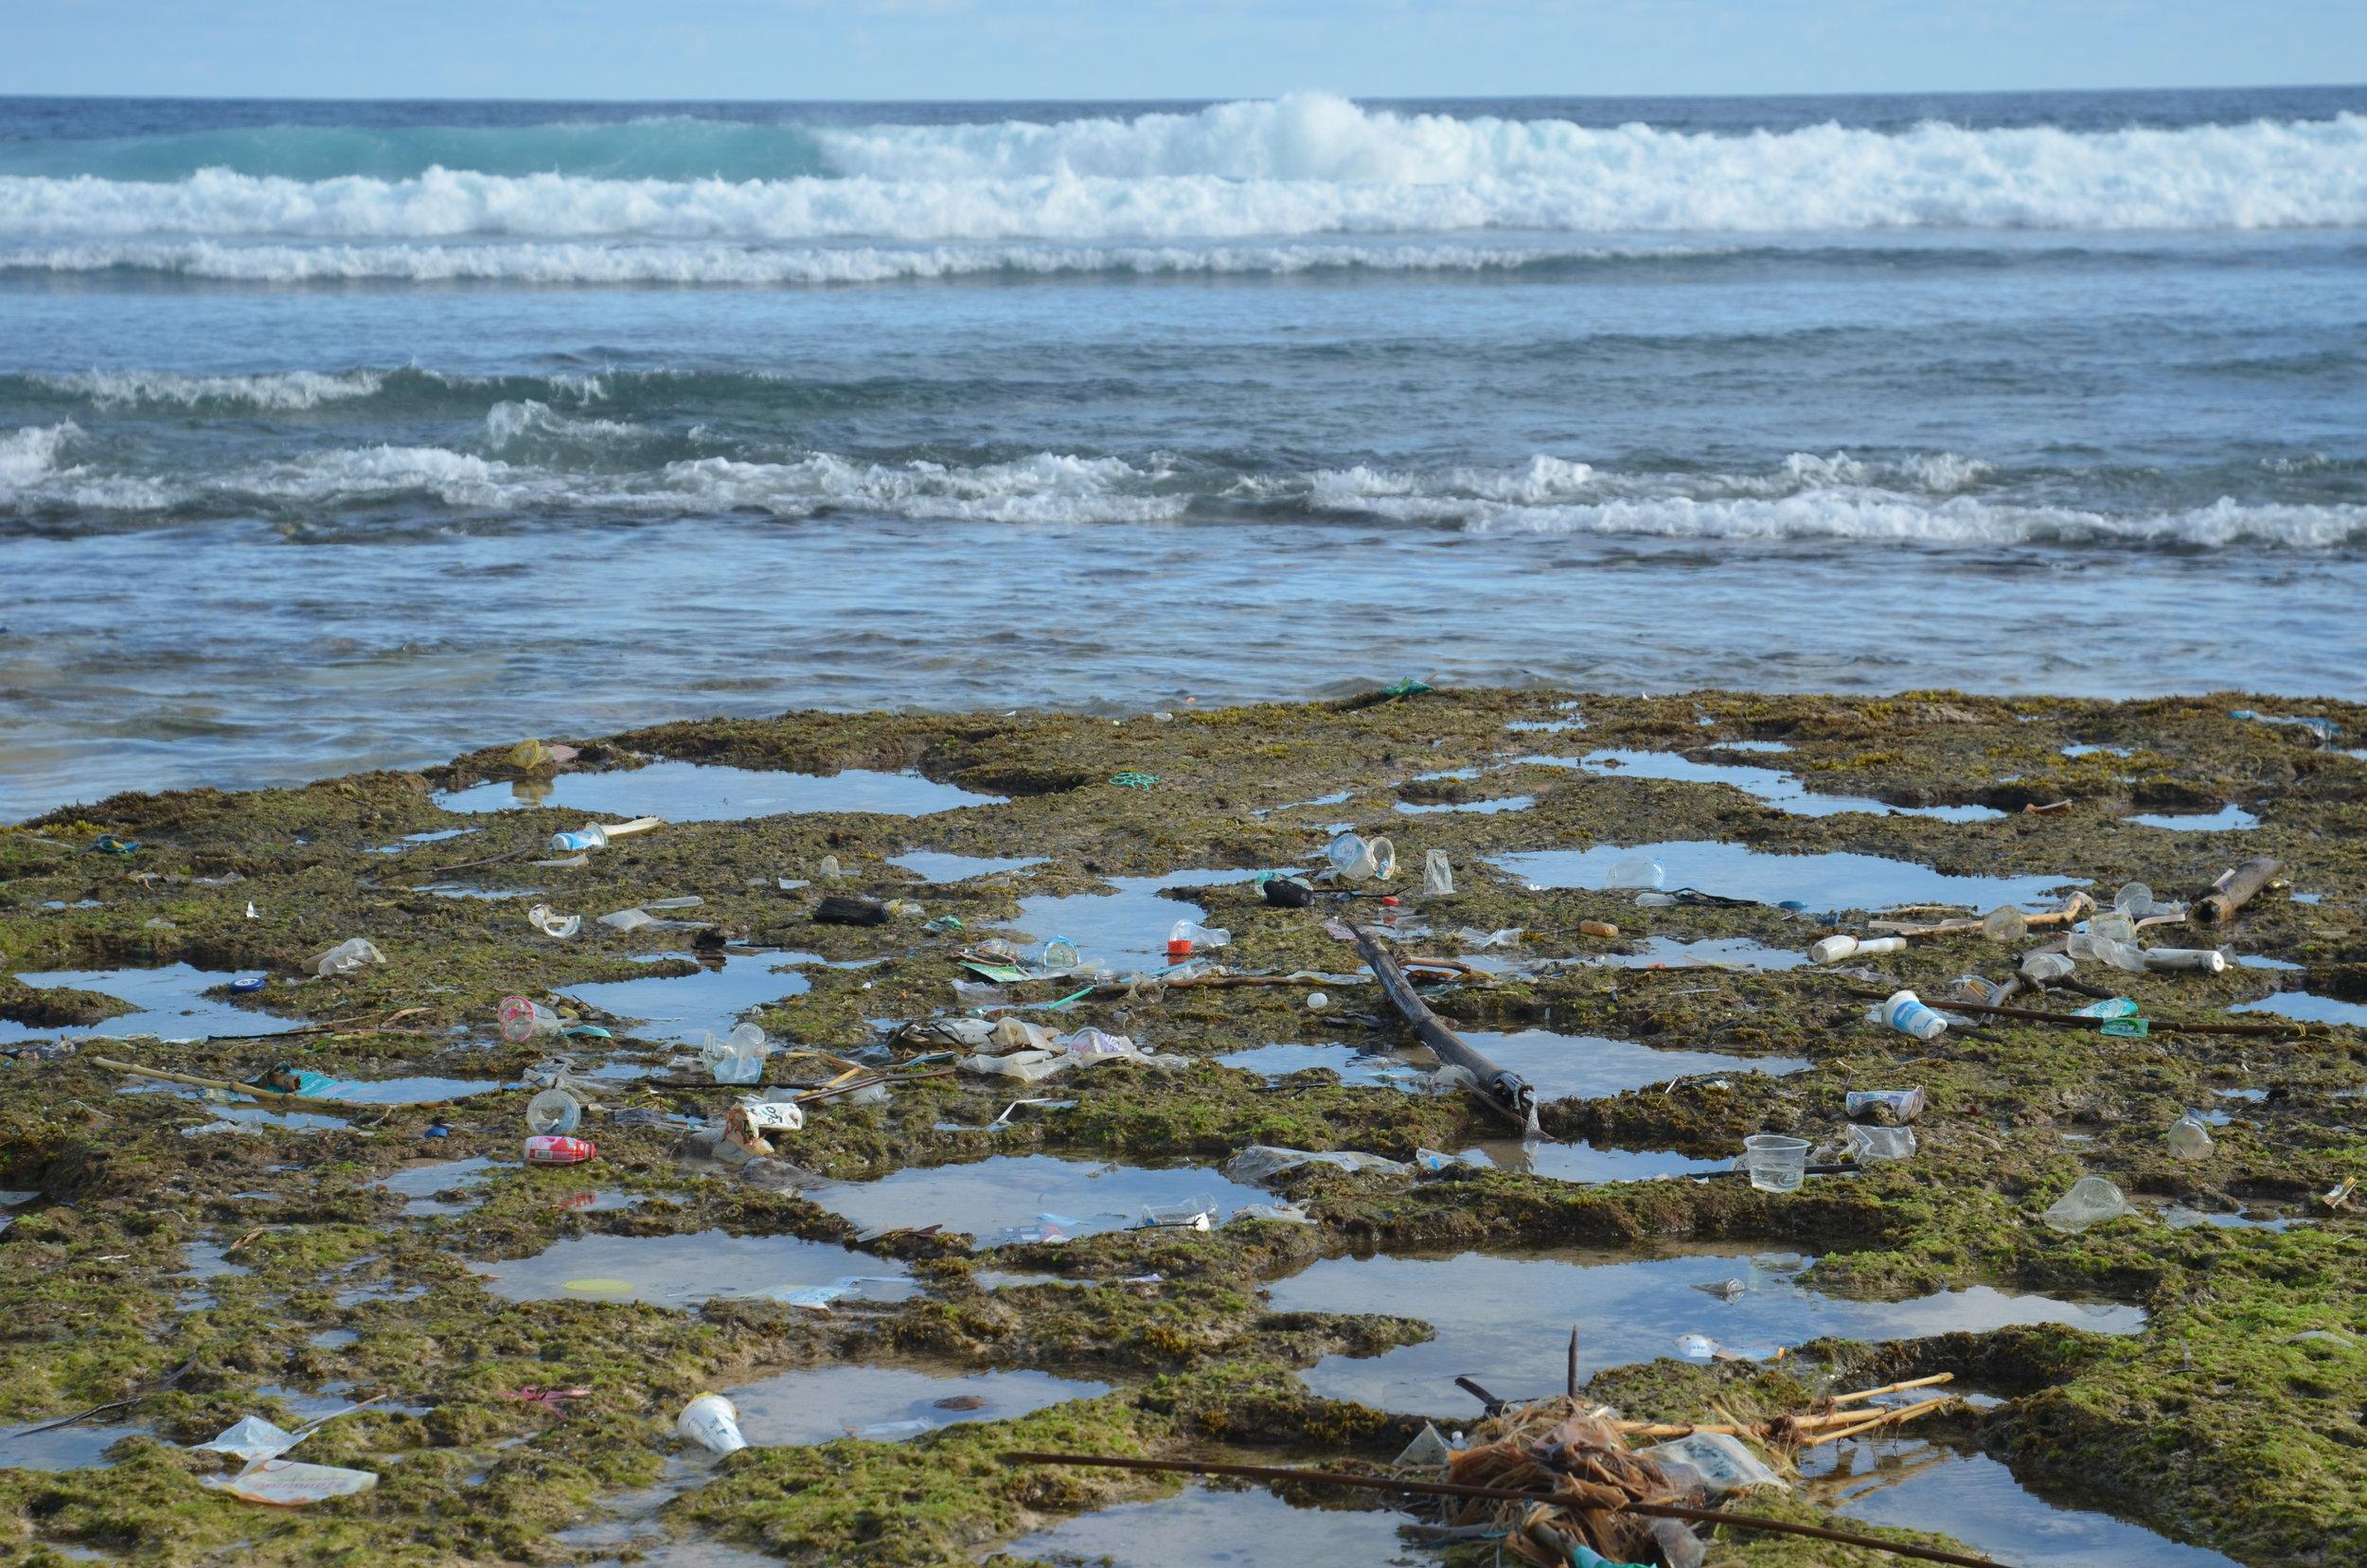 vegan get rid of plastic hawaii blogger travel